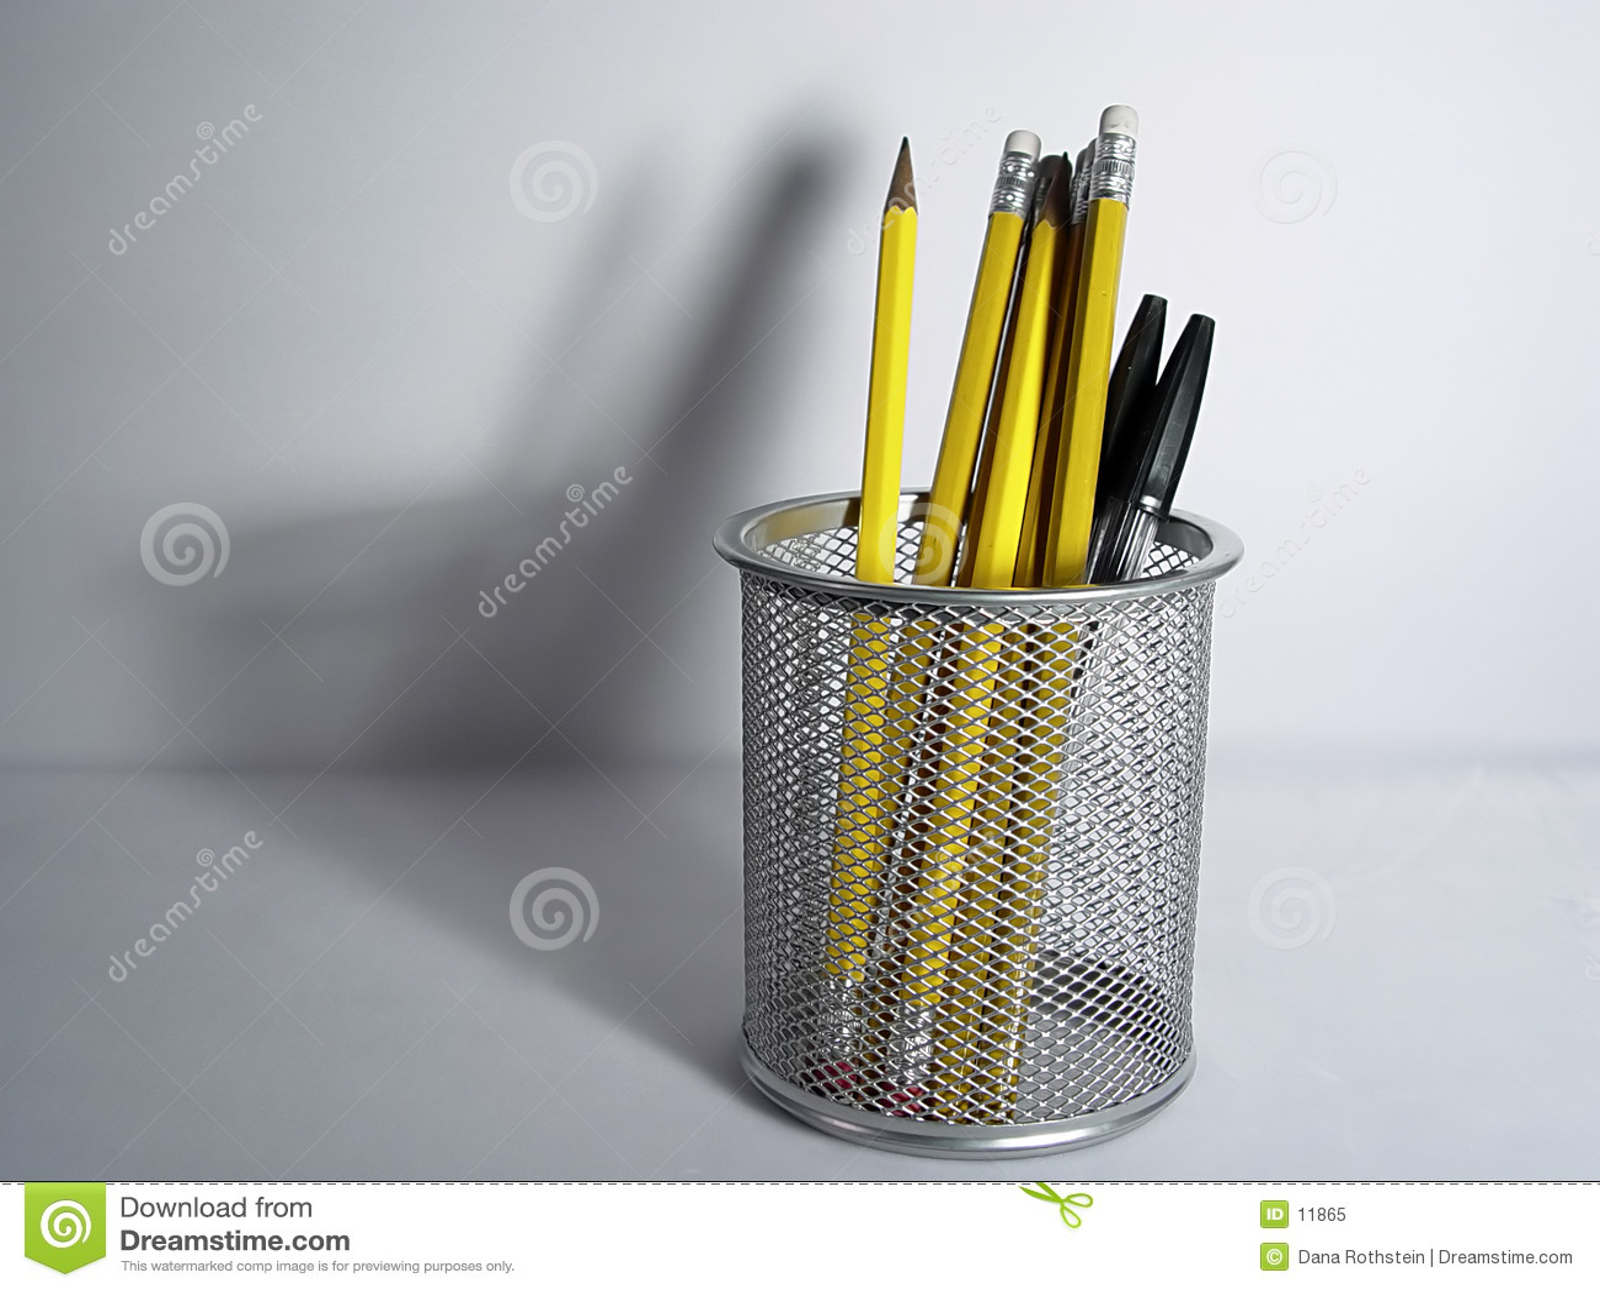 тень карандаша держателя